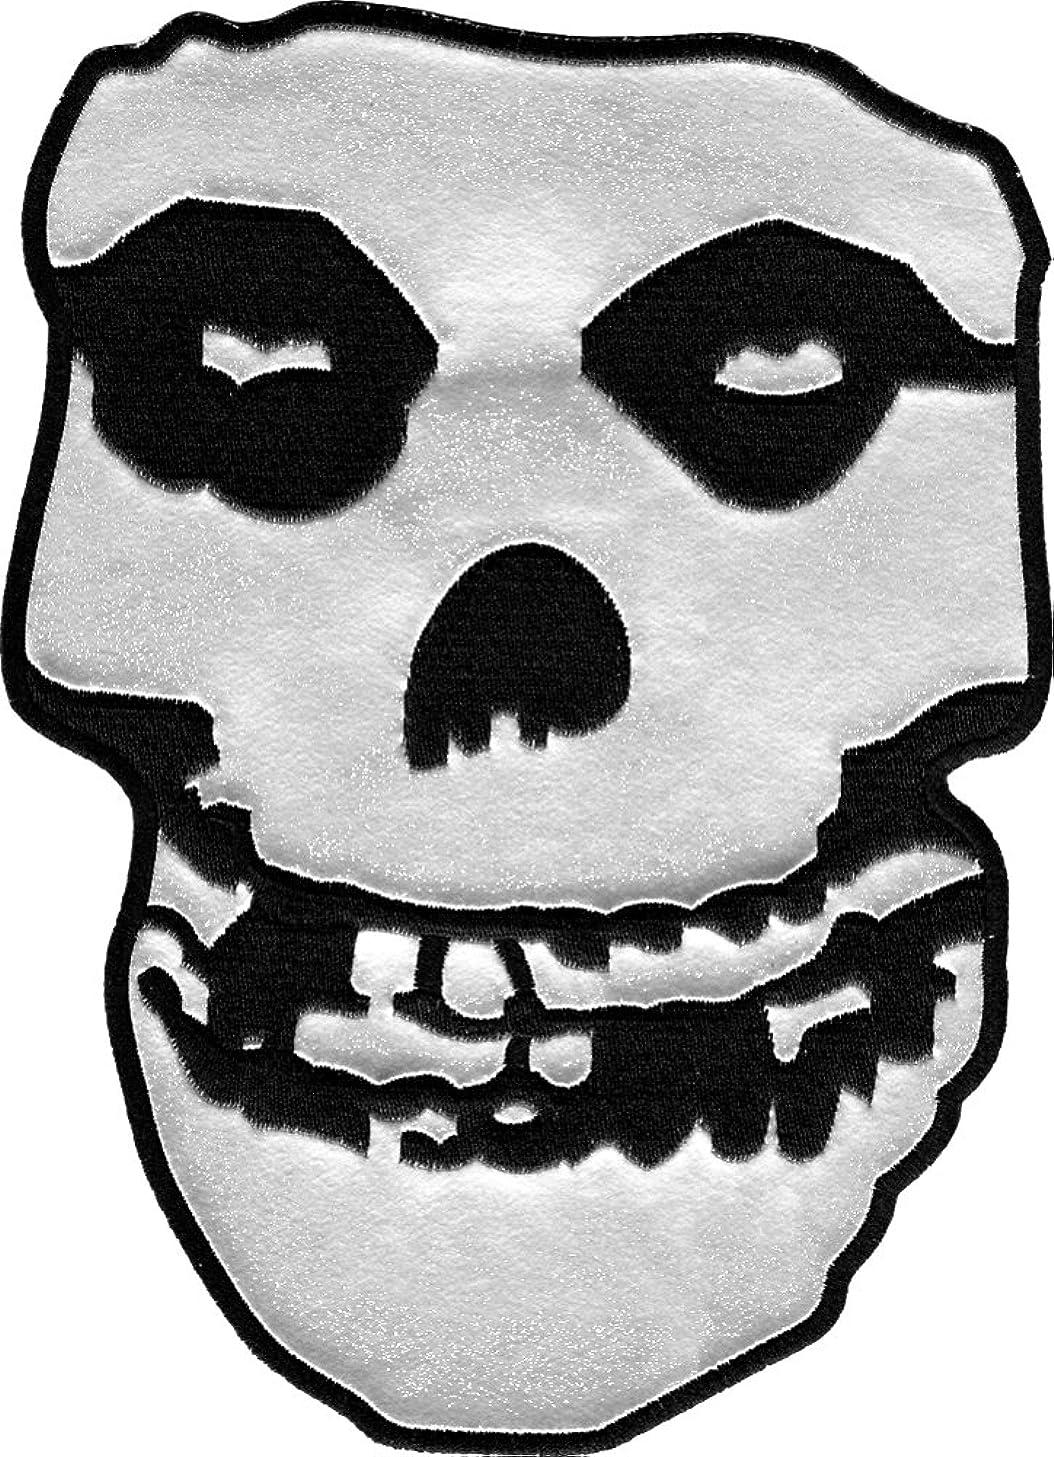 Misfits Skull Back Patch